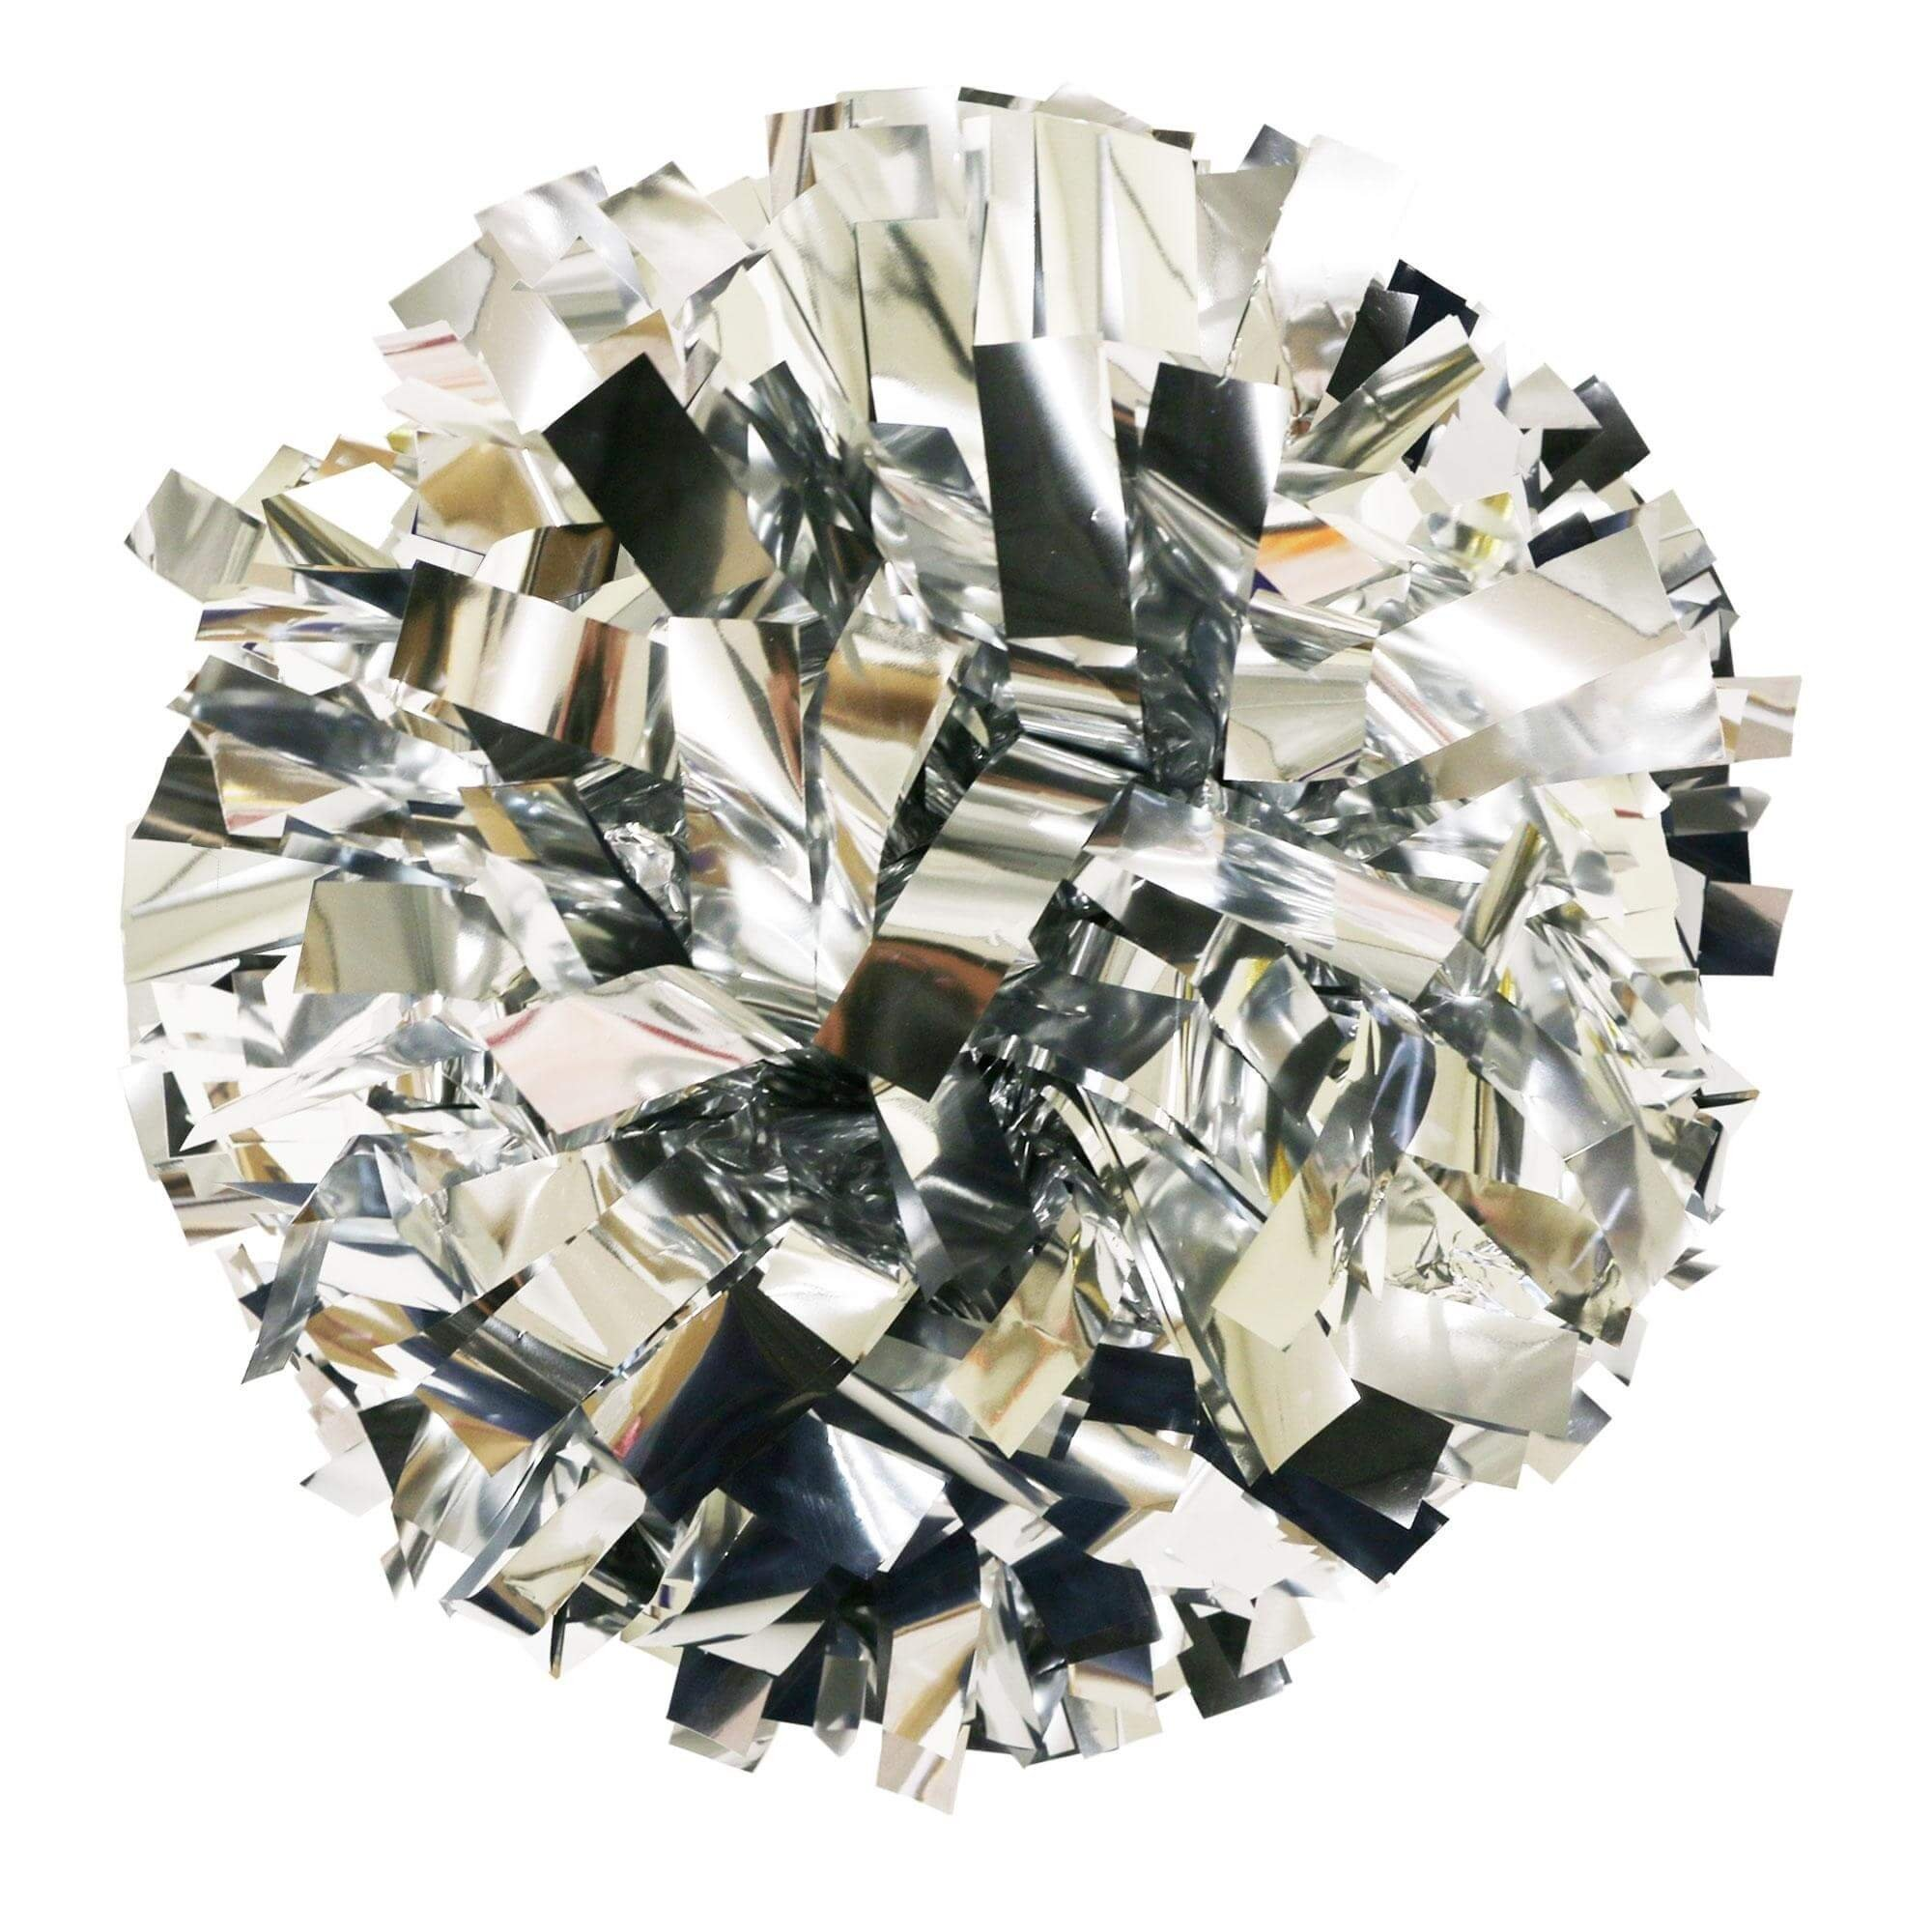 Danzcue Silver Metallic Poms - One Pair